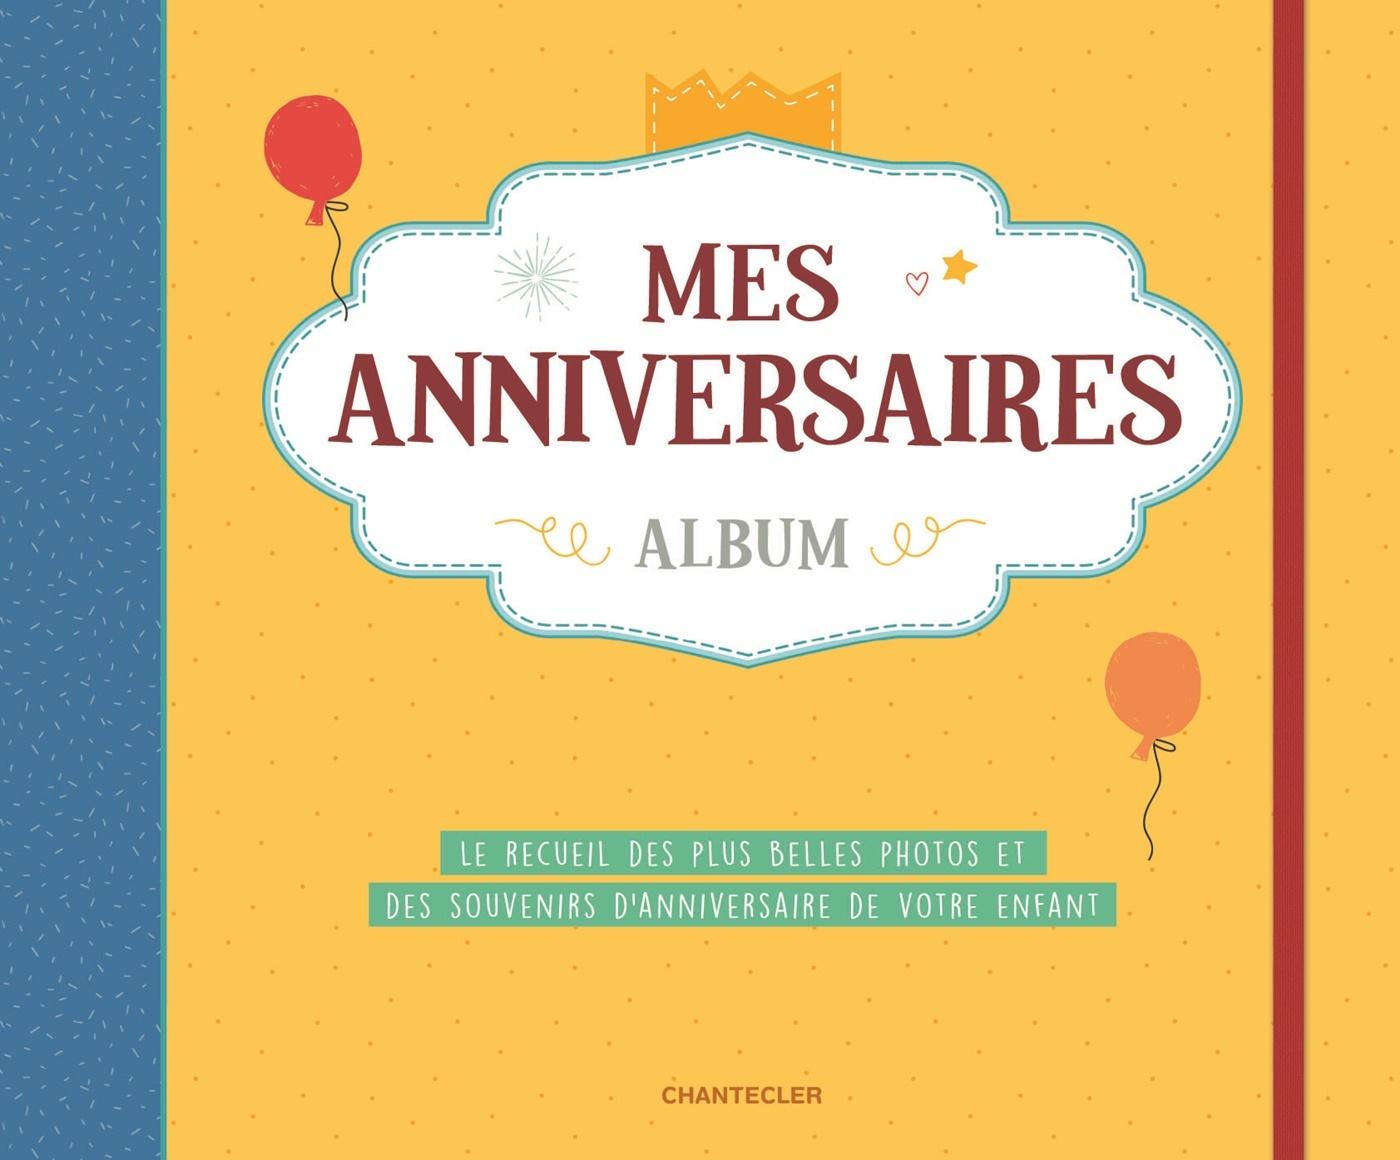 MES ANNIVERSAIRES - ALBUM